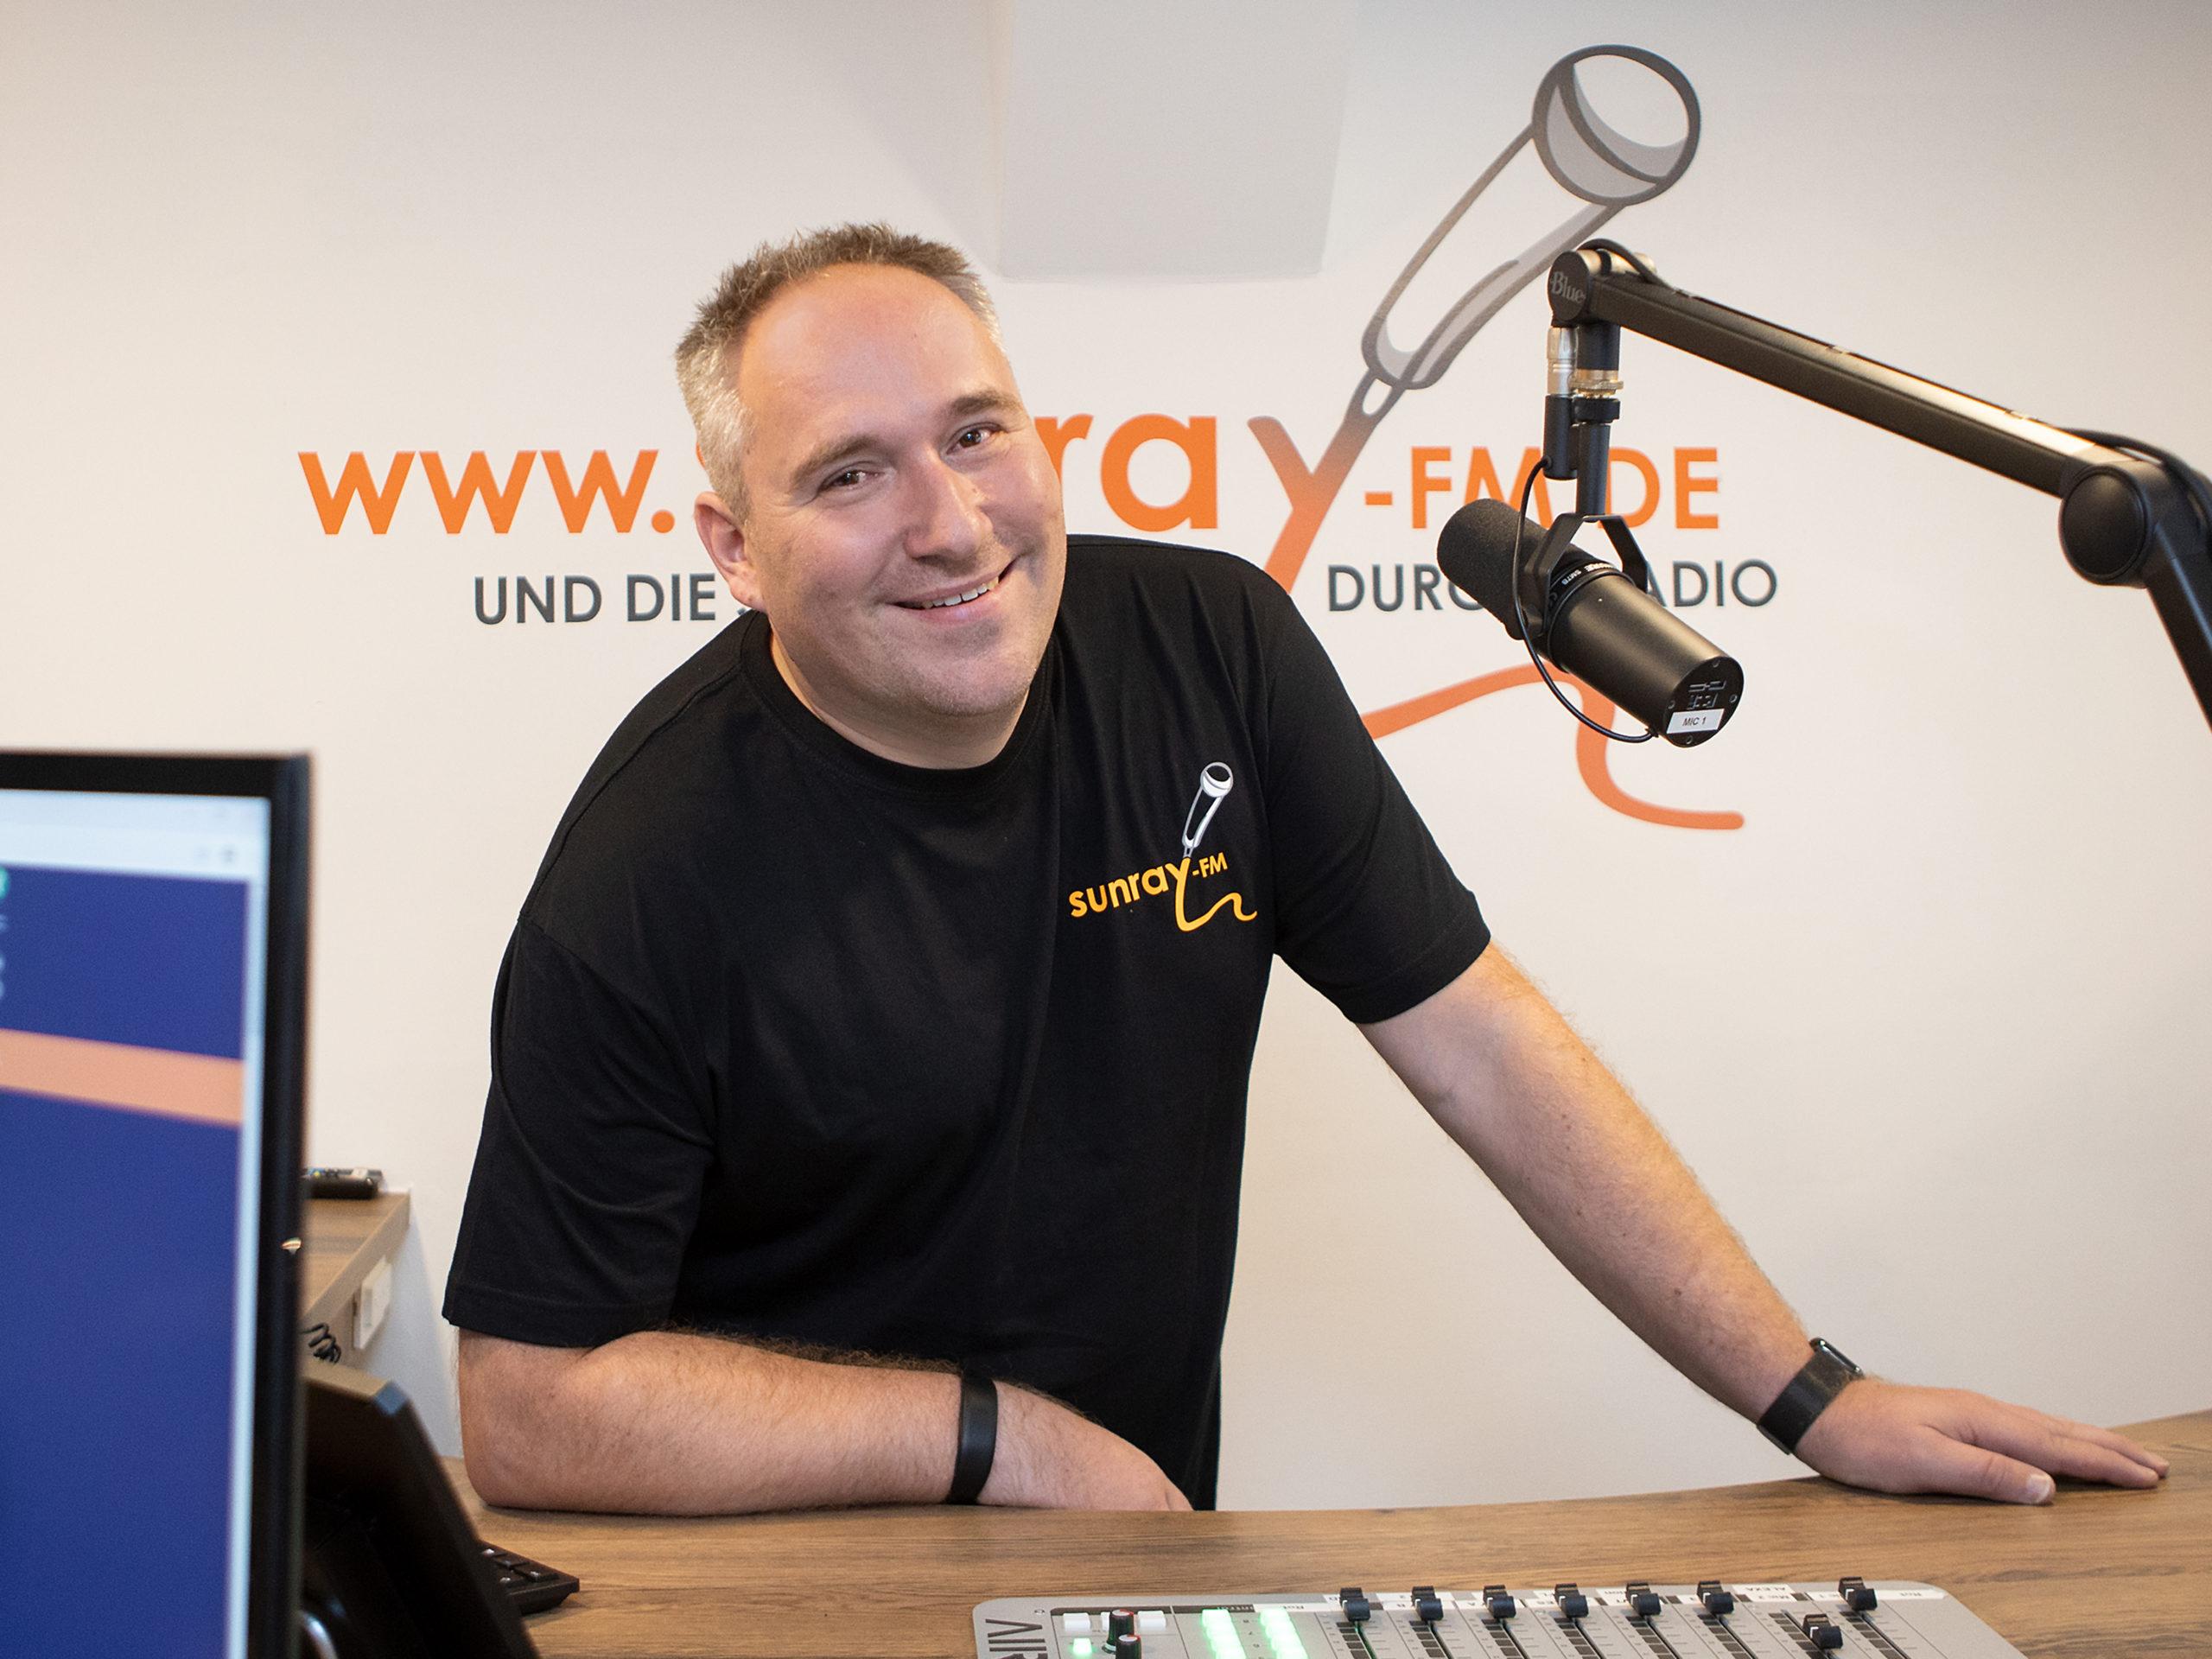 Schoto - Sunray FM